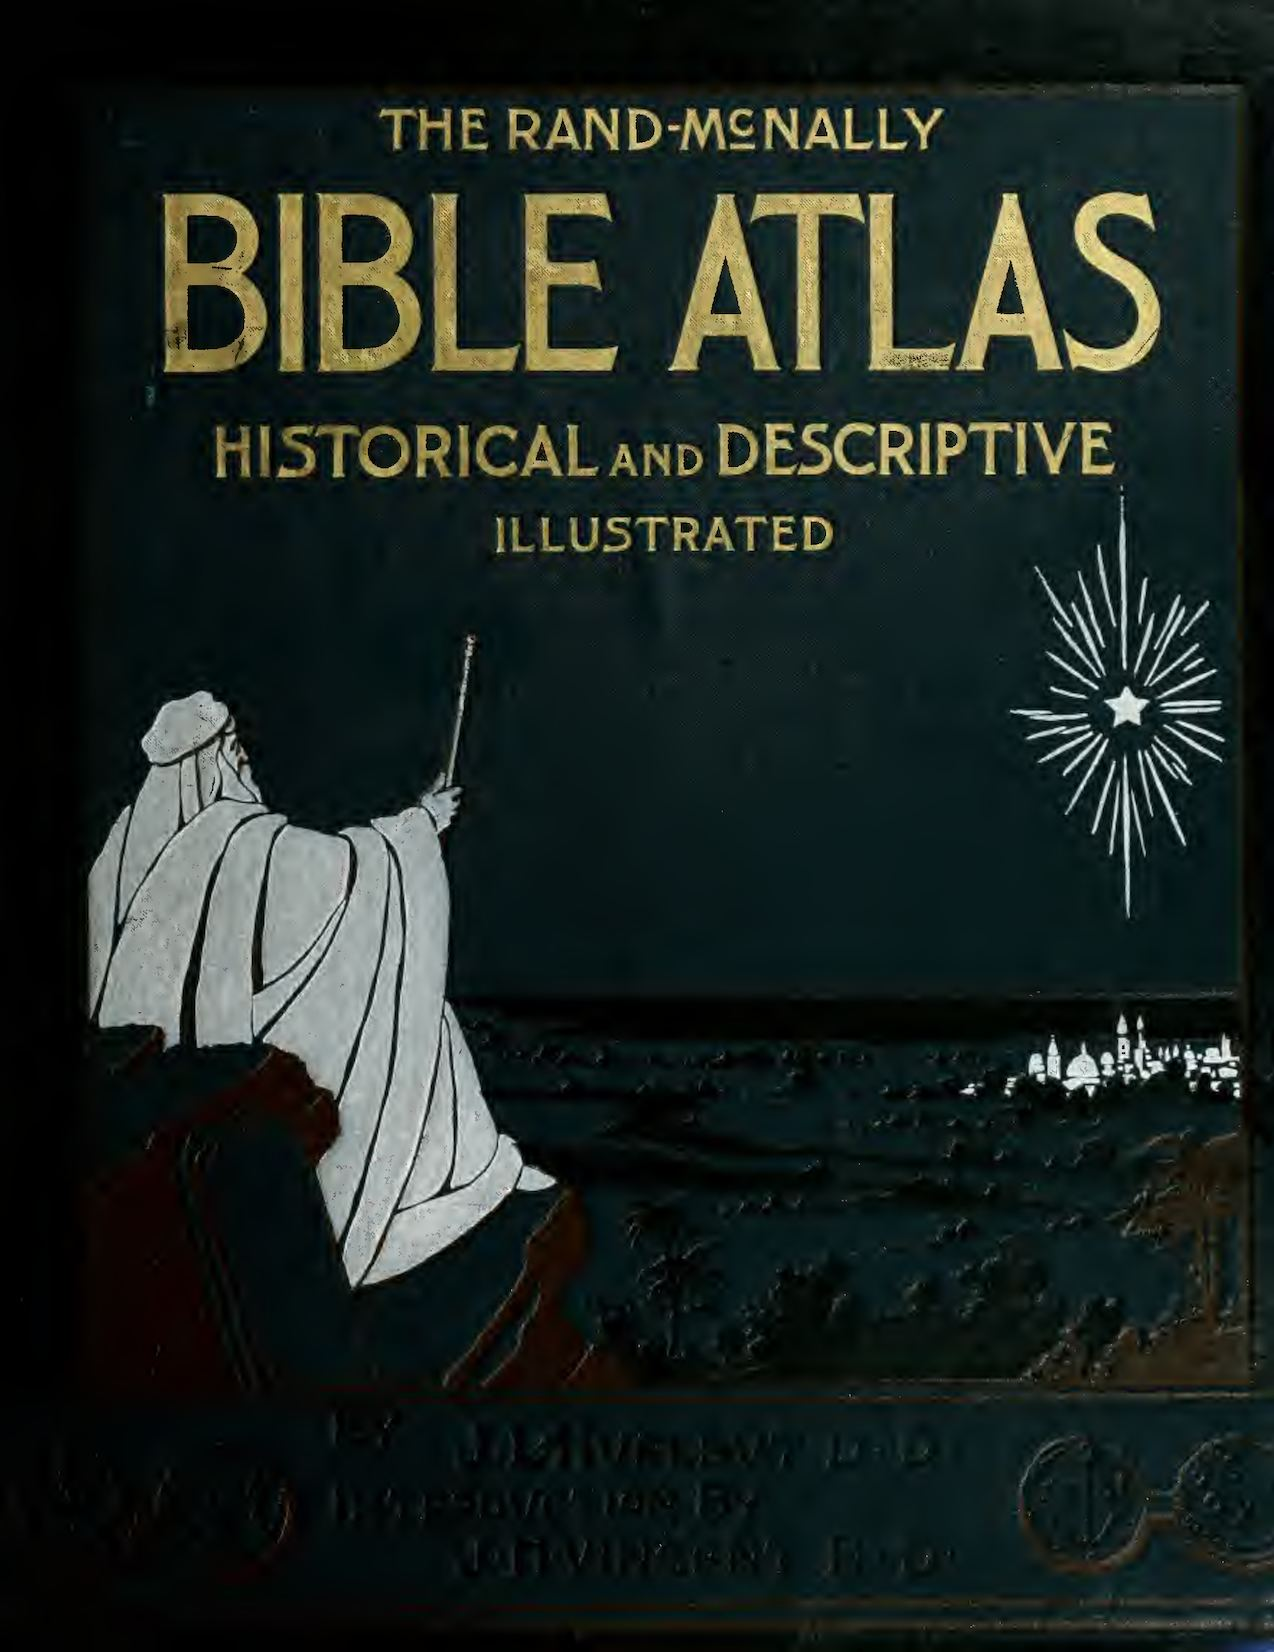 Calamo Bible Atlas Manual Tendencies Long Pants Ash Grey Denim Stretch Abu Tua 30